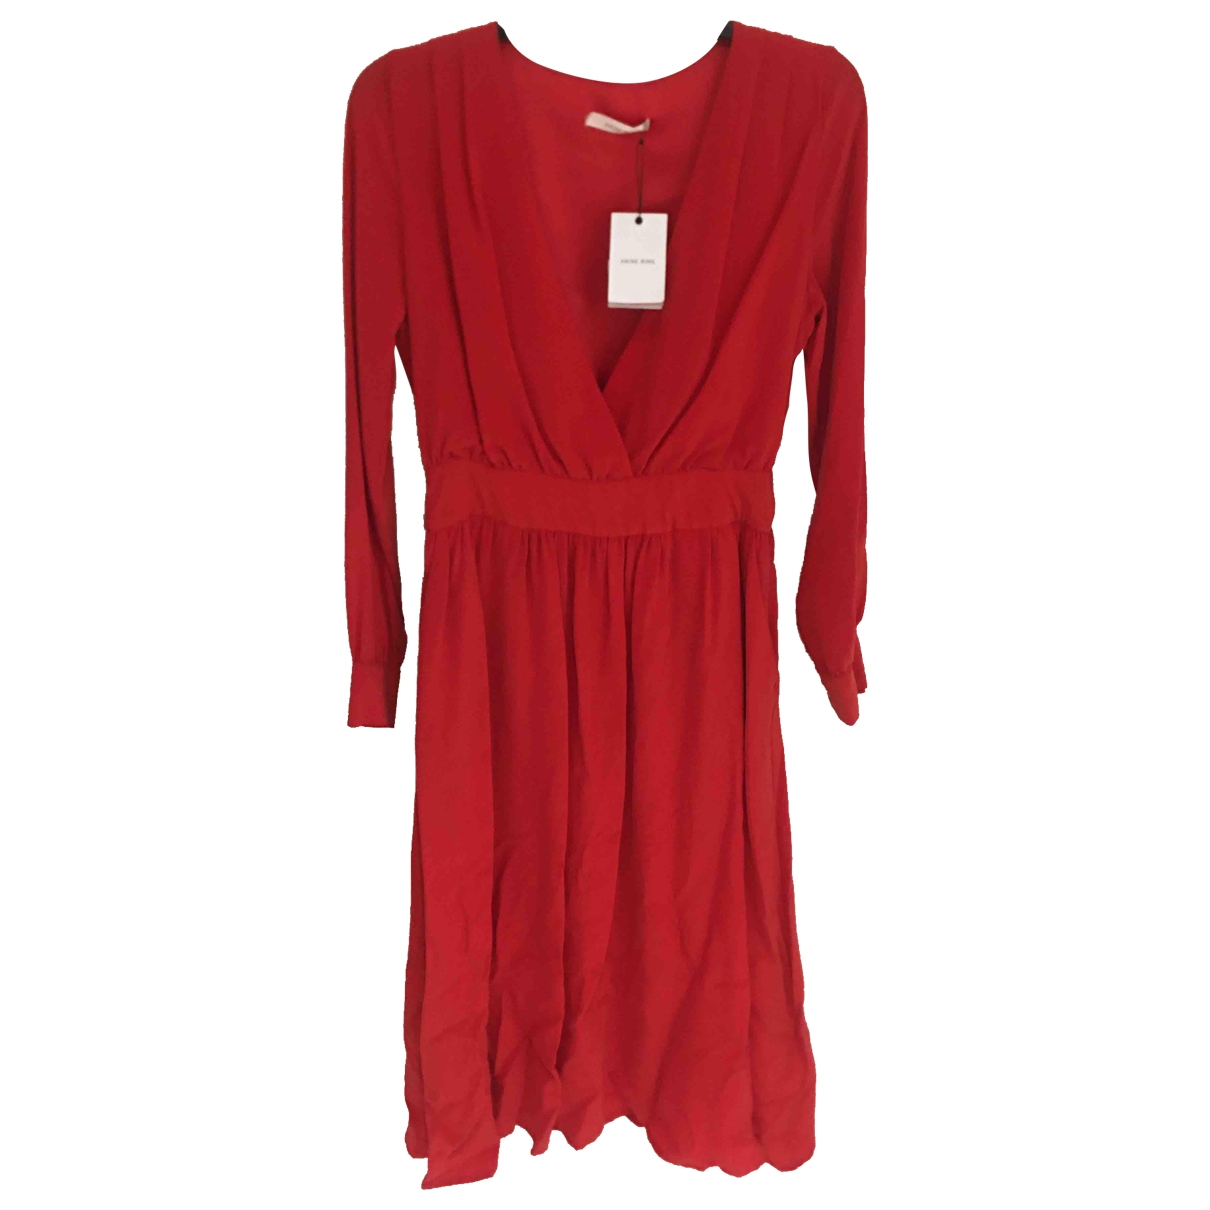 Anine Bing \N Red Silk dress for Women M International